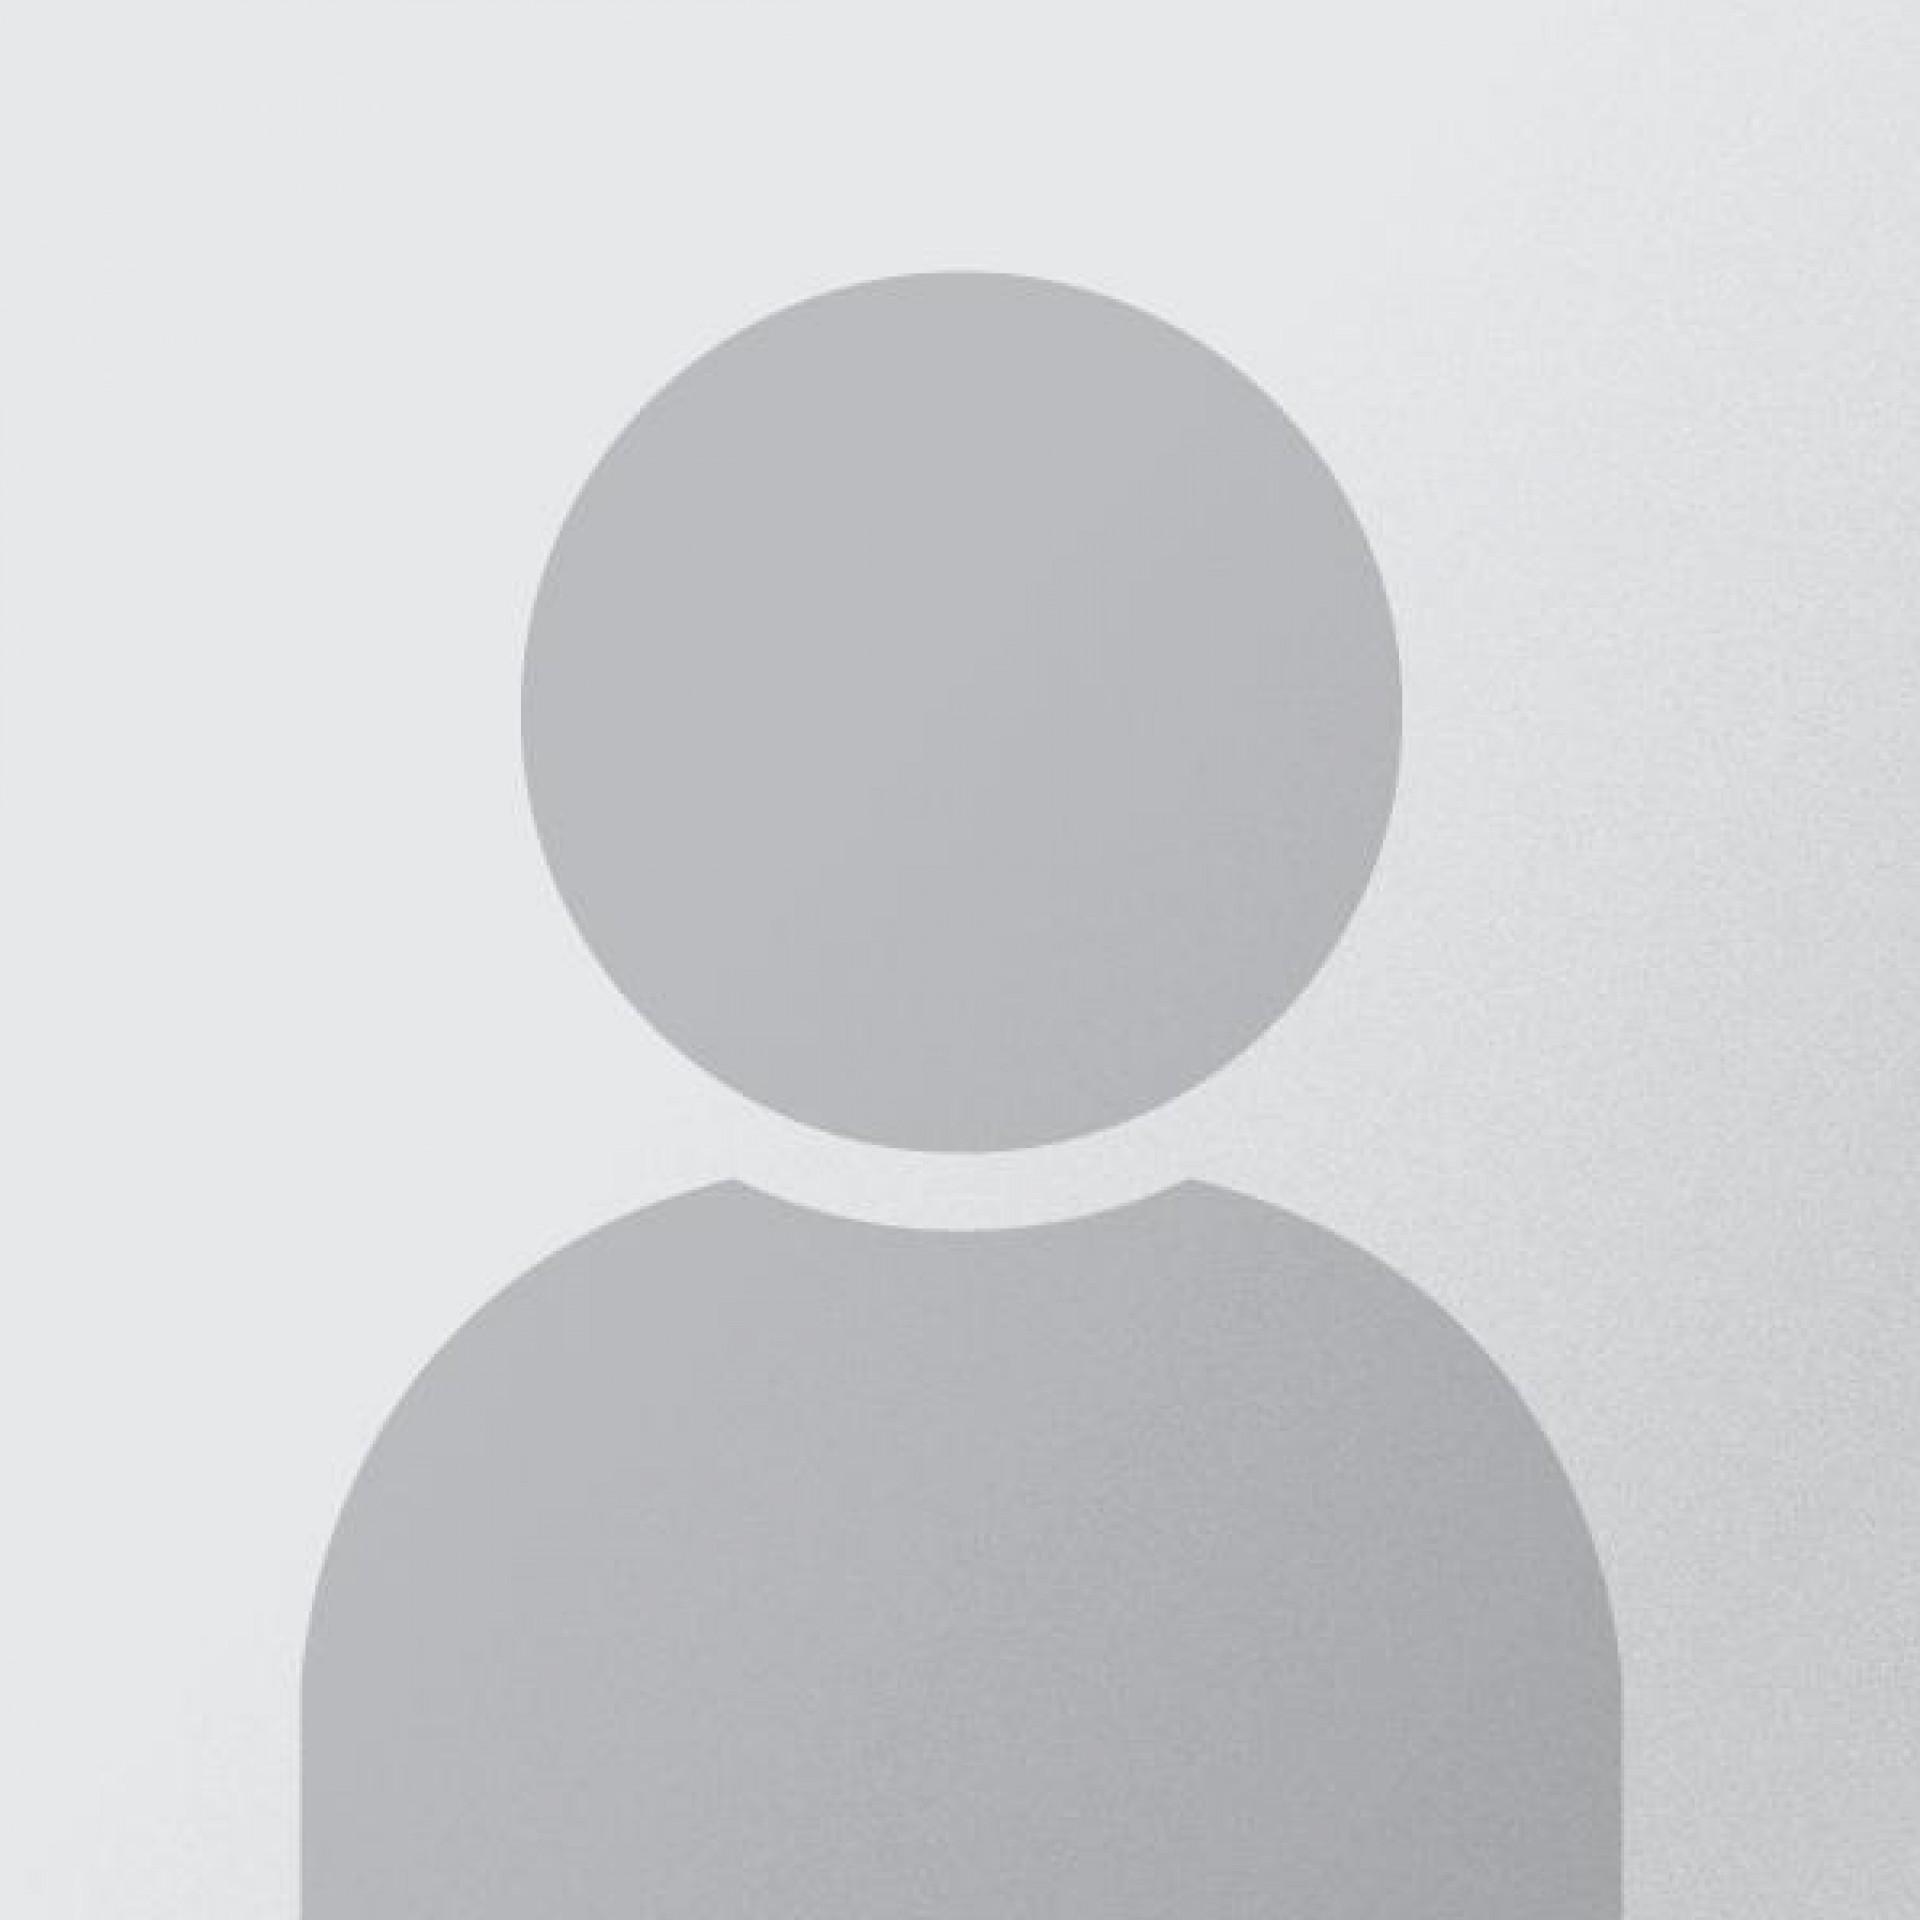 fotografia p021 profilu 0101CRYKMU